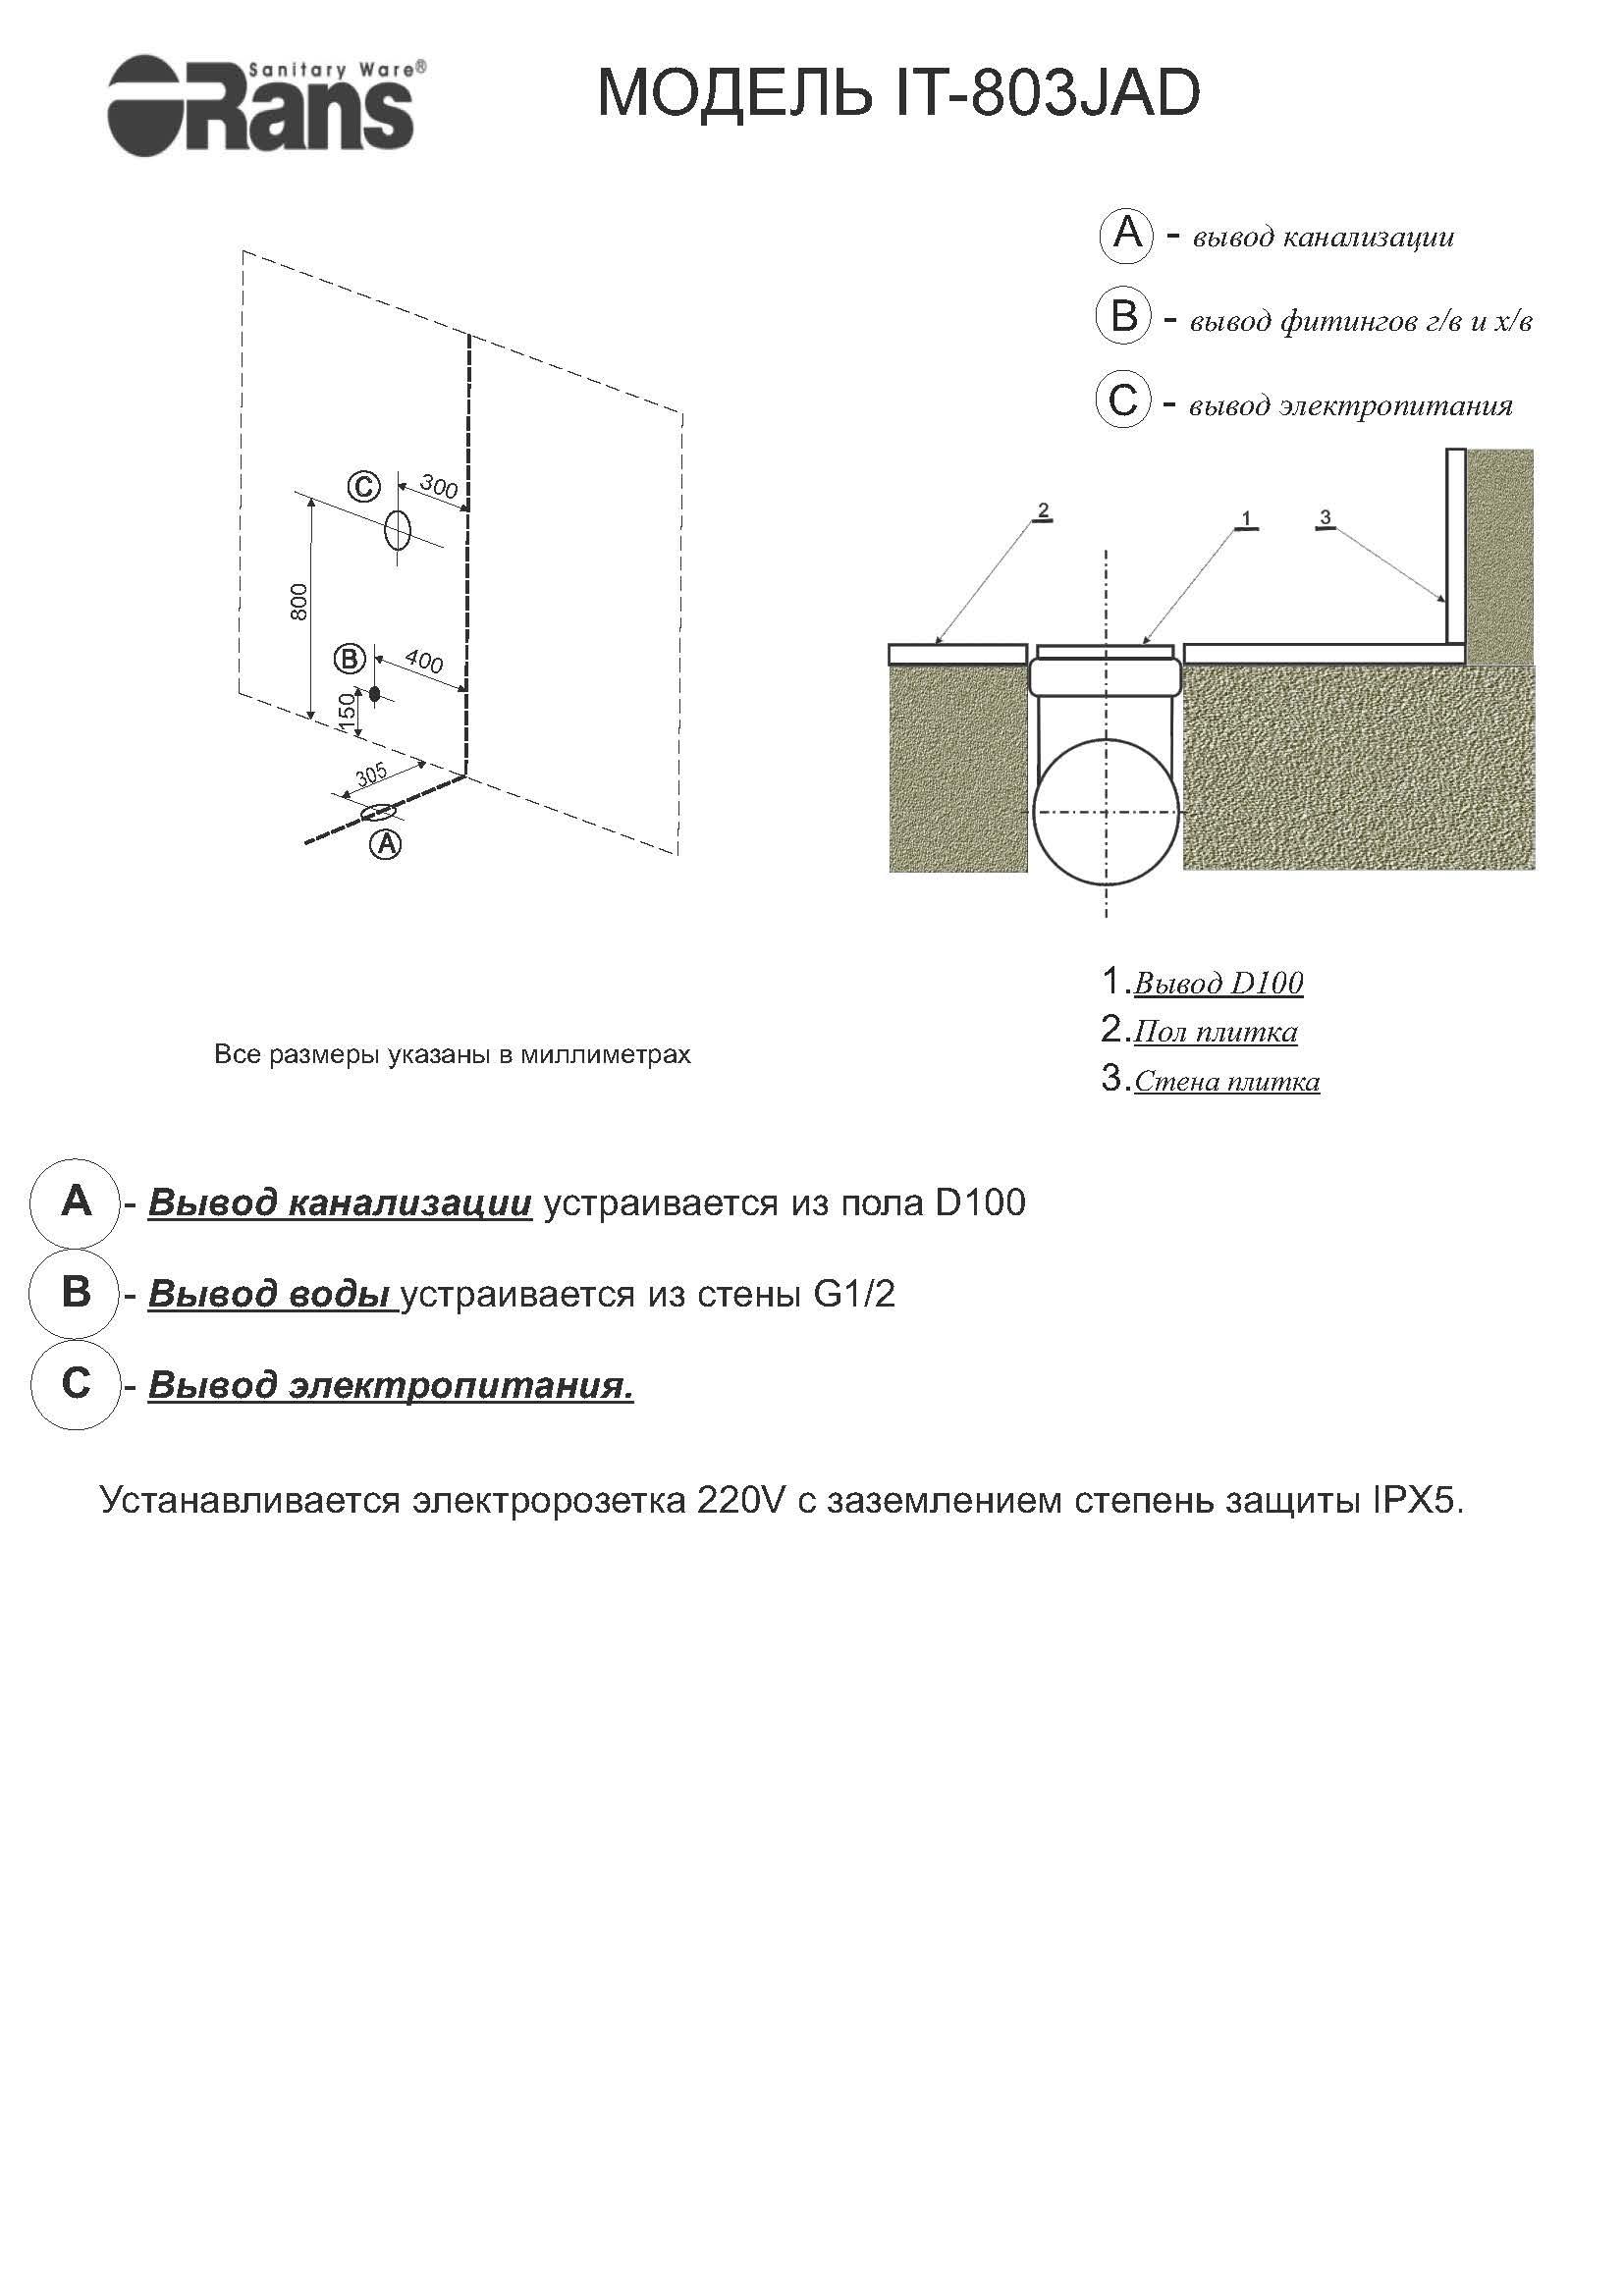 Монтажная схема IT-803JAD